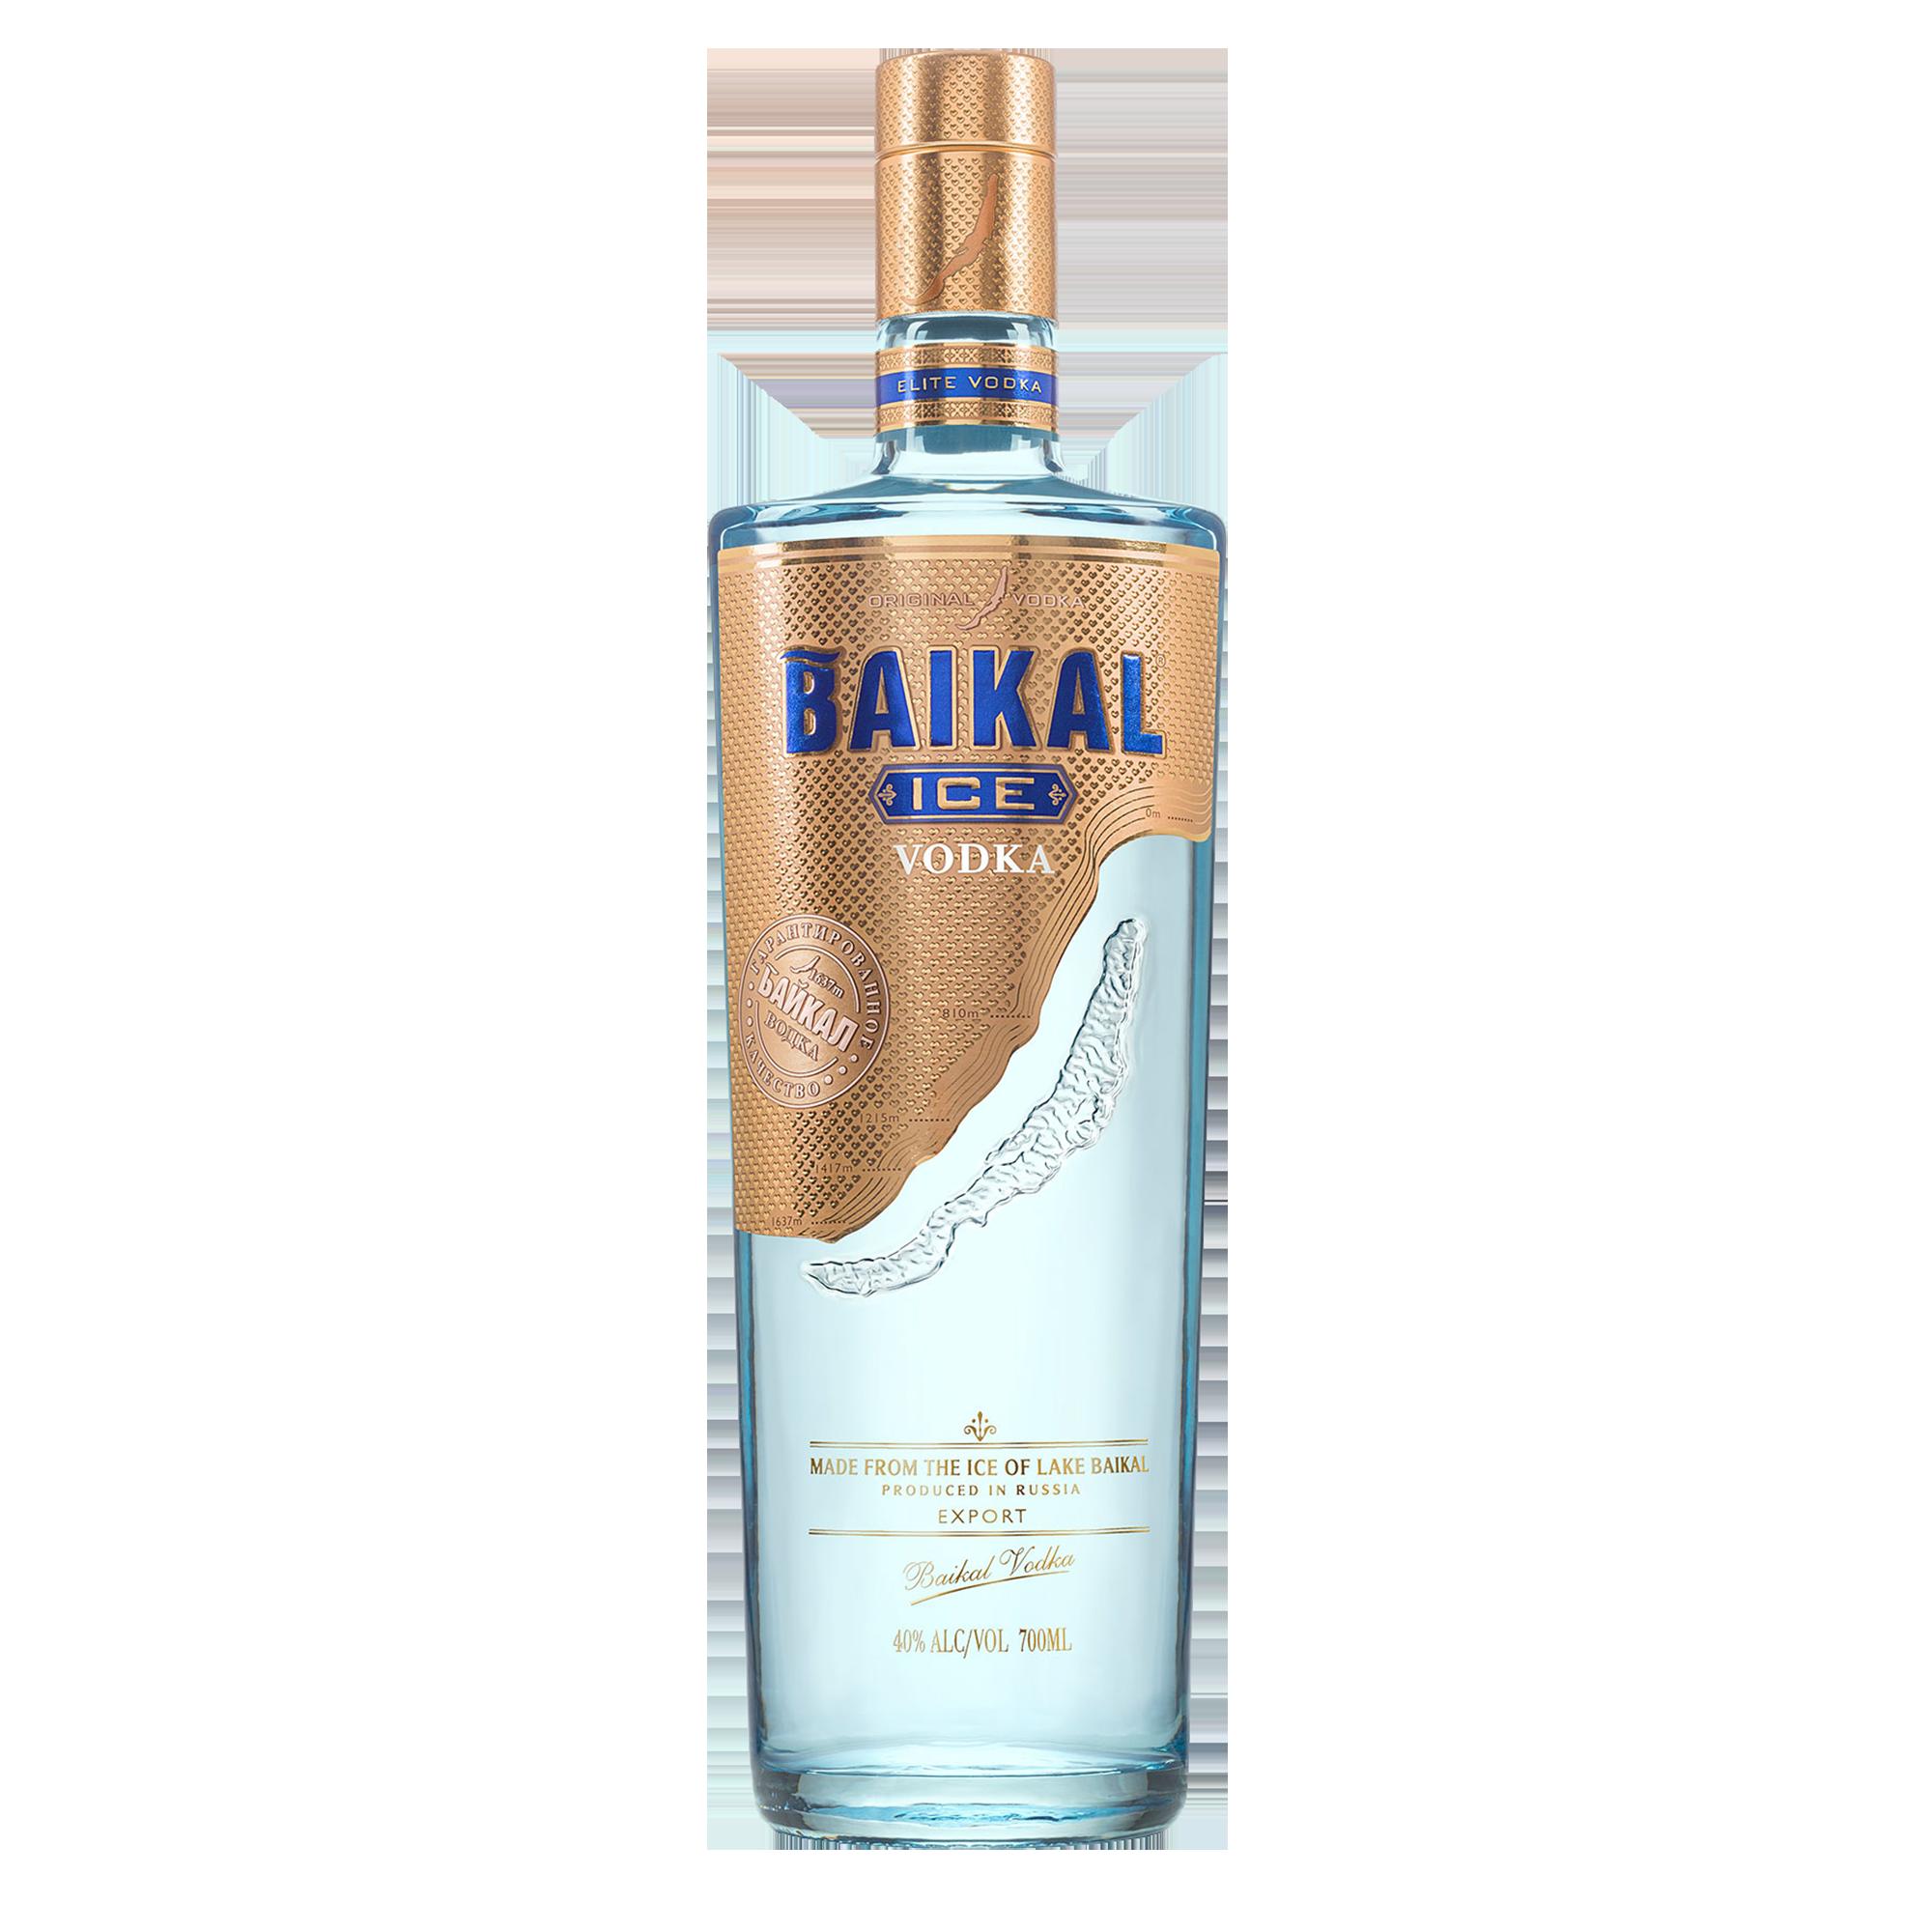 Baikal Ice Vodka